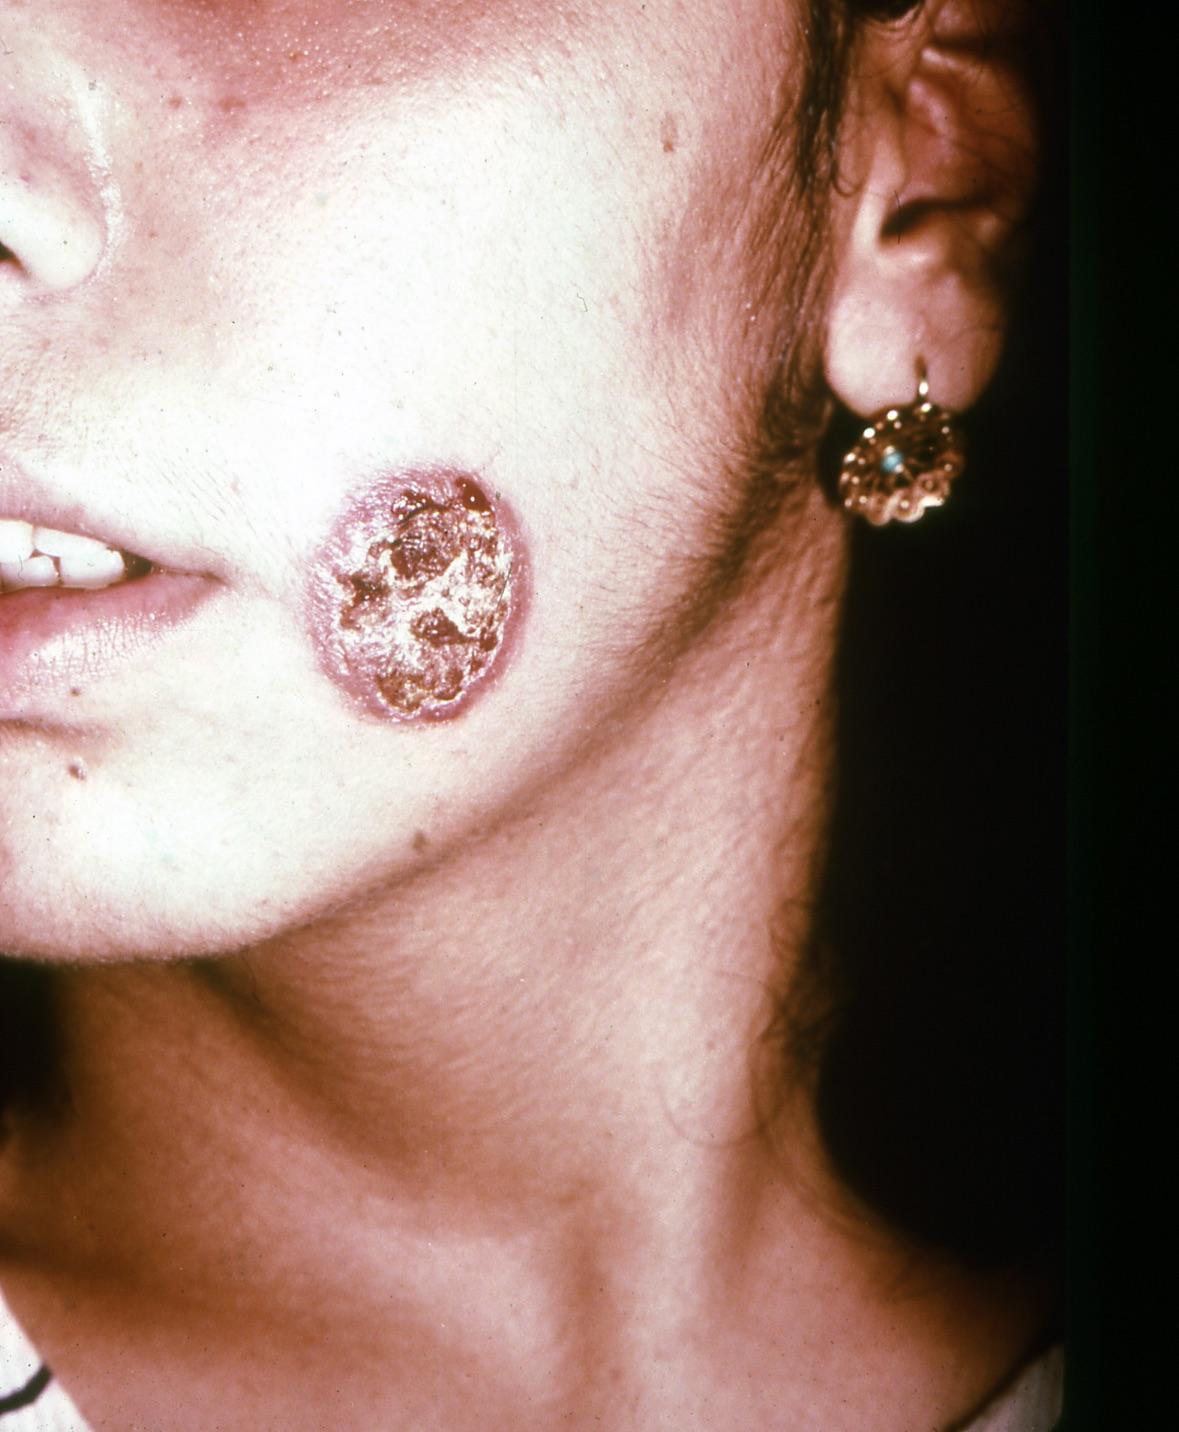 Cutaneous leishmaniasis, old lesion.